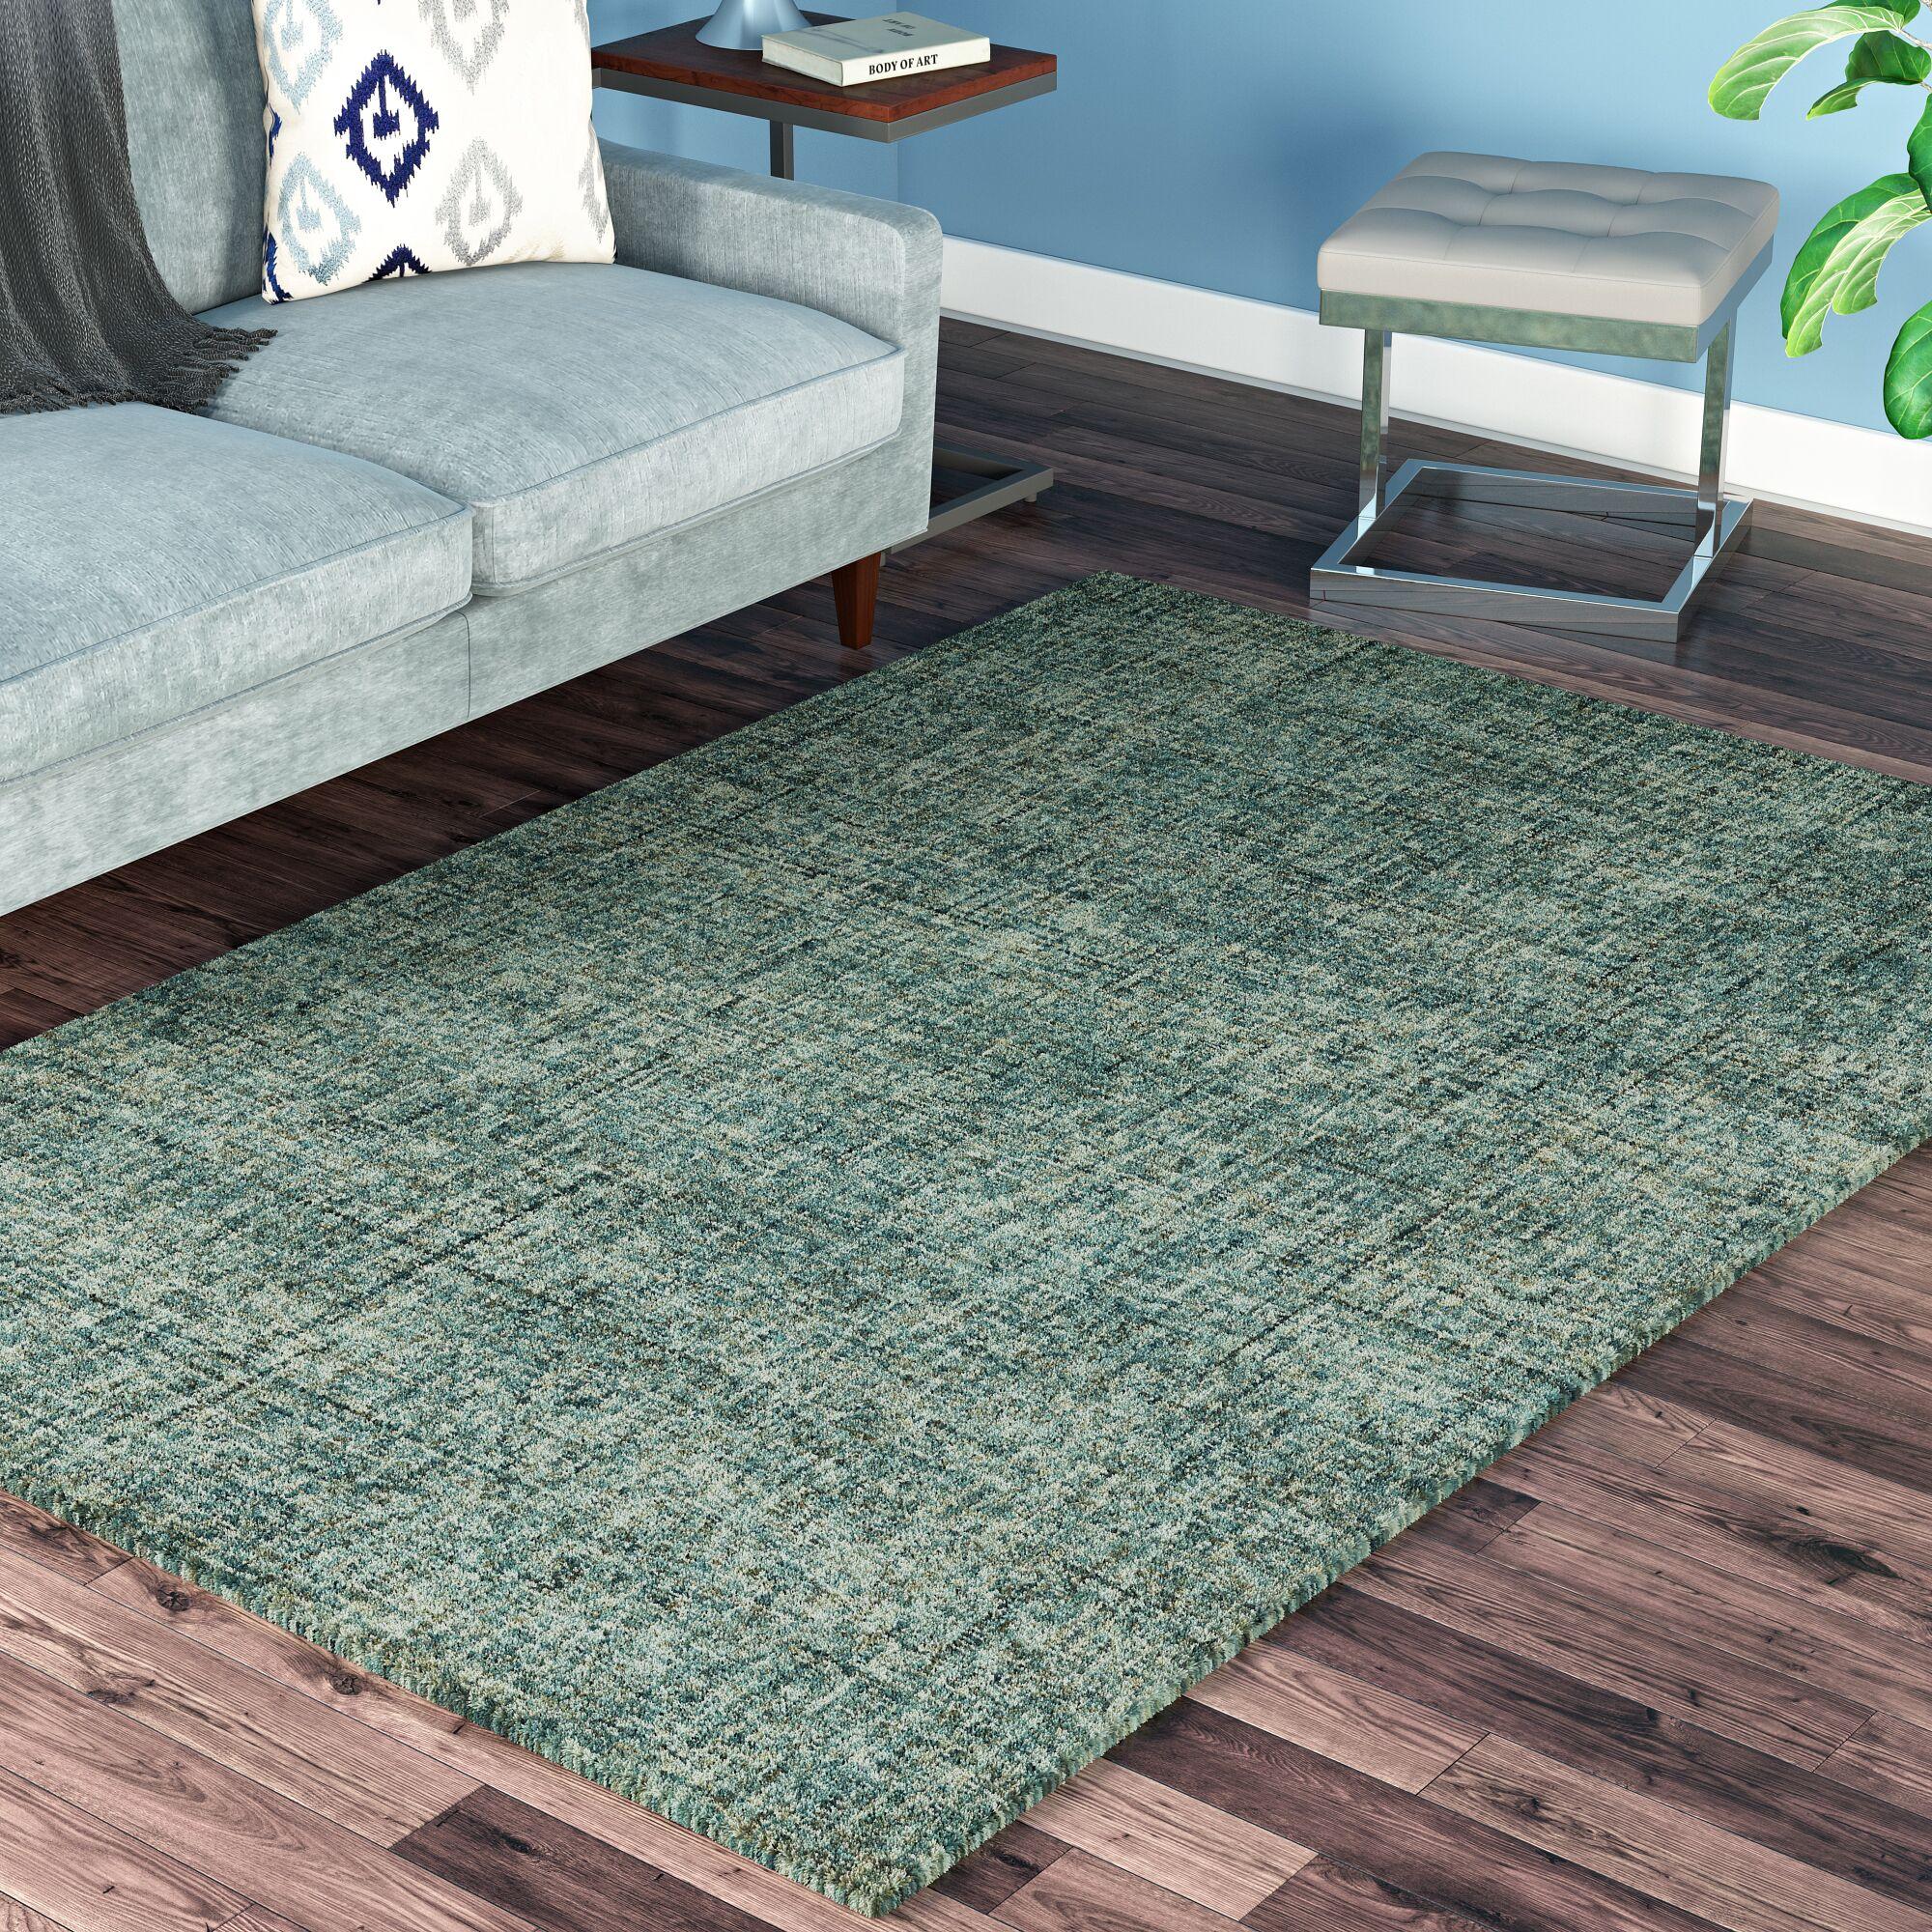 Gilboa Hand-Tufted Wool Turquoise Area Rug Rug Size: Rectangle 3'6